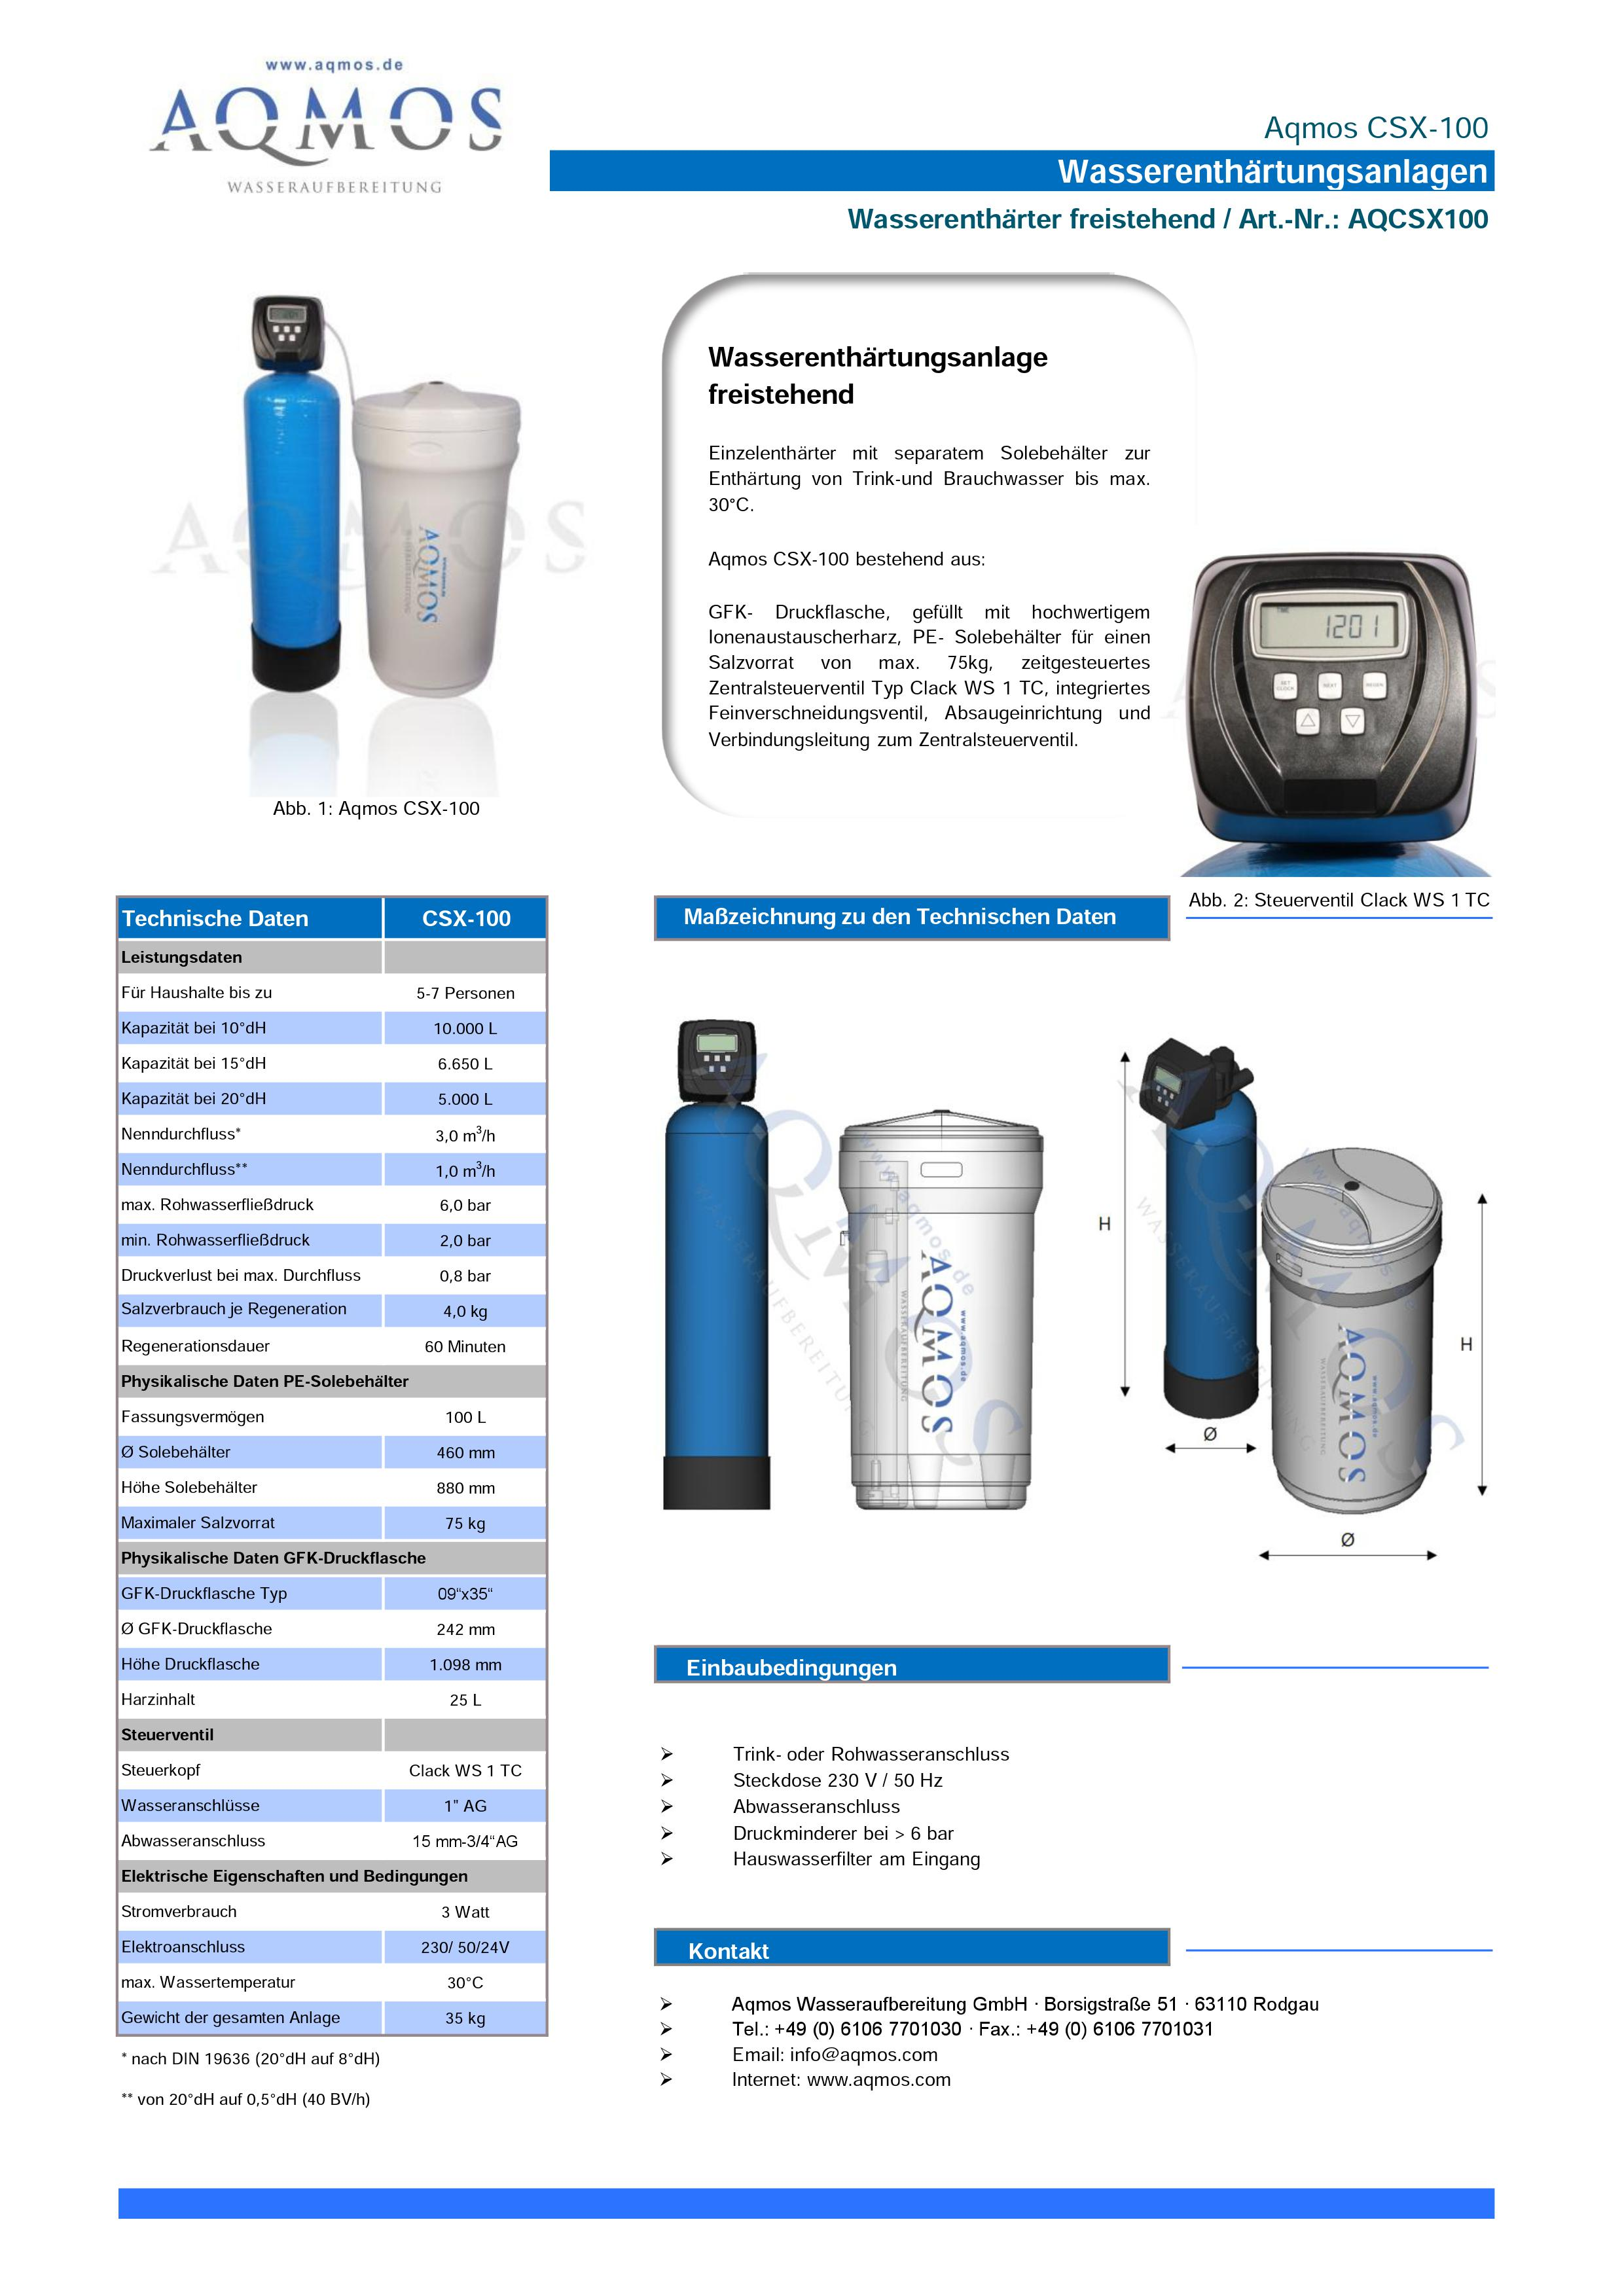 CSX-100-Datenblatt